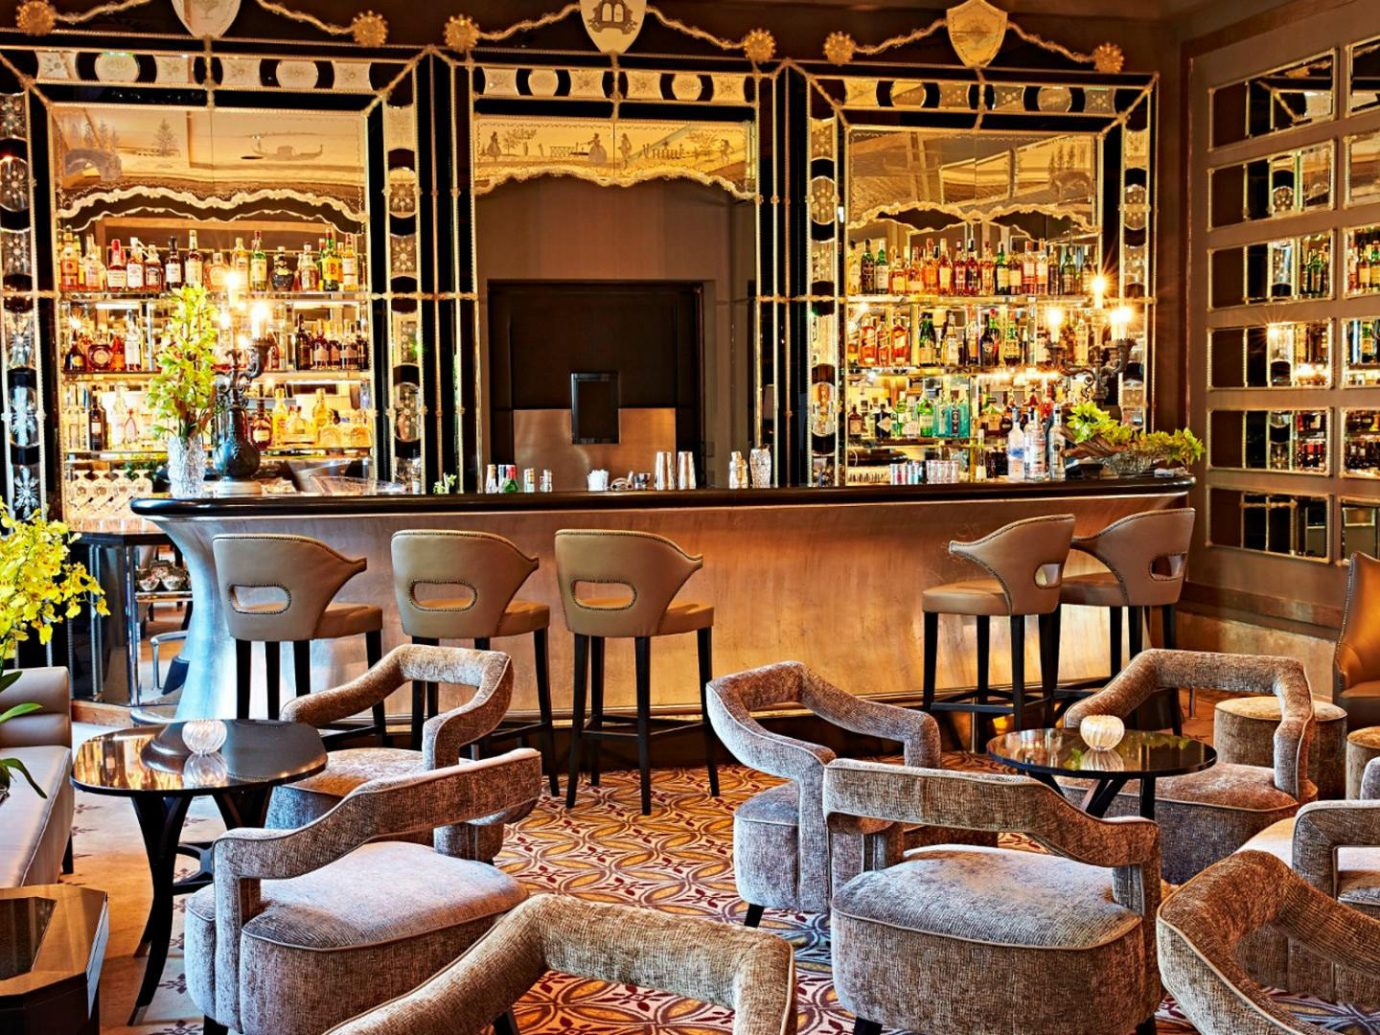 Hotels Italy Luxury Travel Venice chair Dining Bar meal restaurant interior design café estate furniture